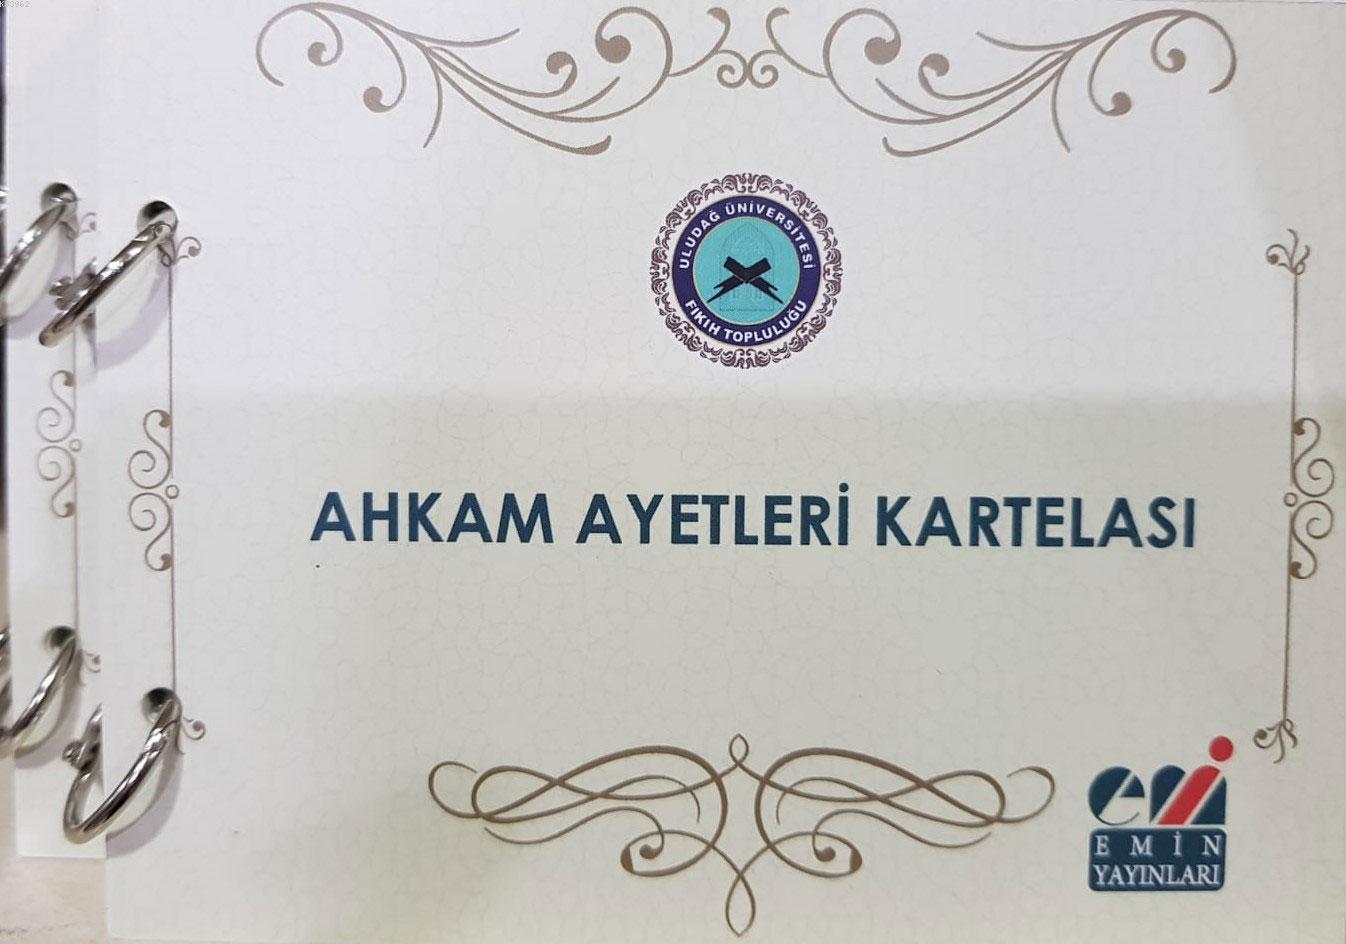 AHKAM AYETLERİ KARTALASI